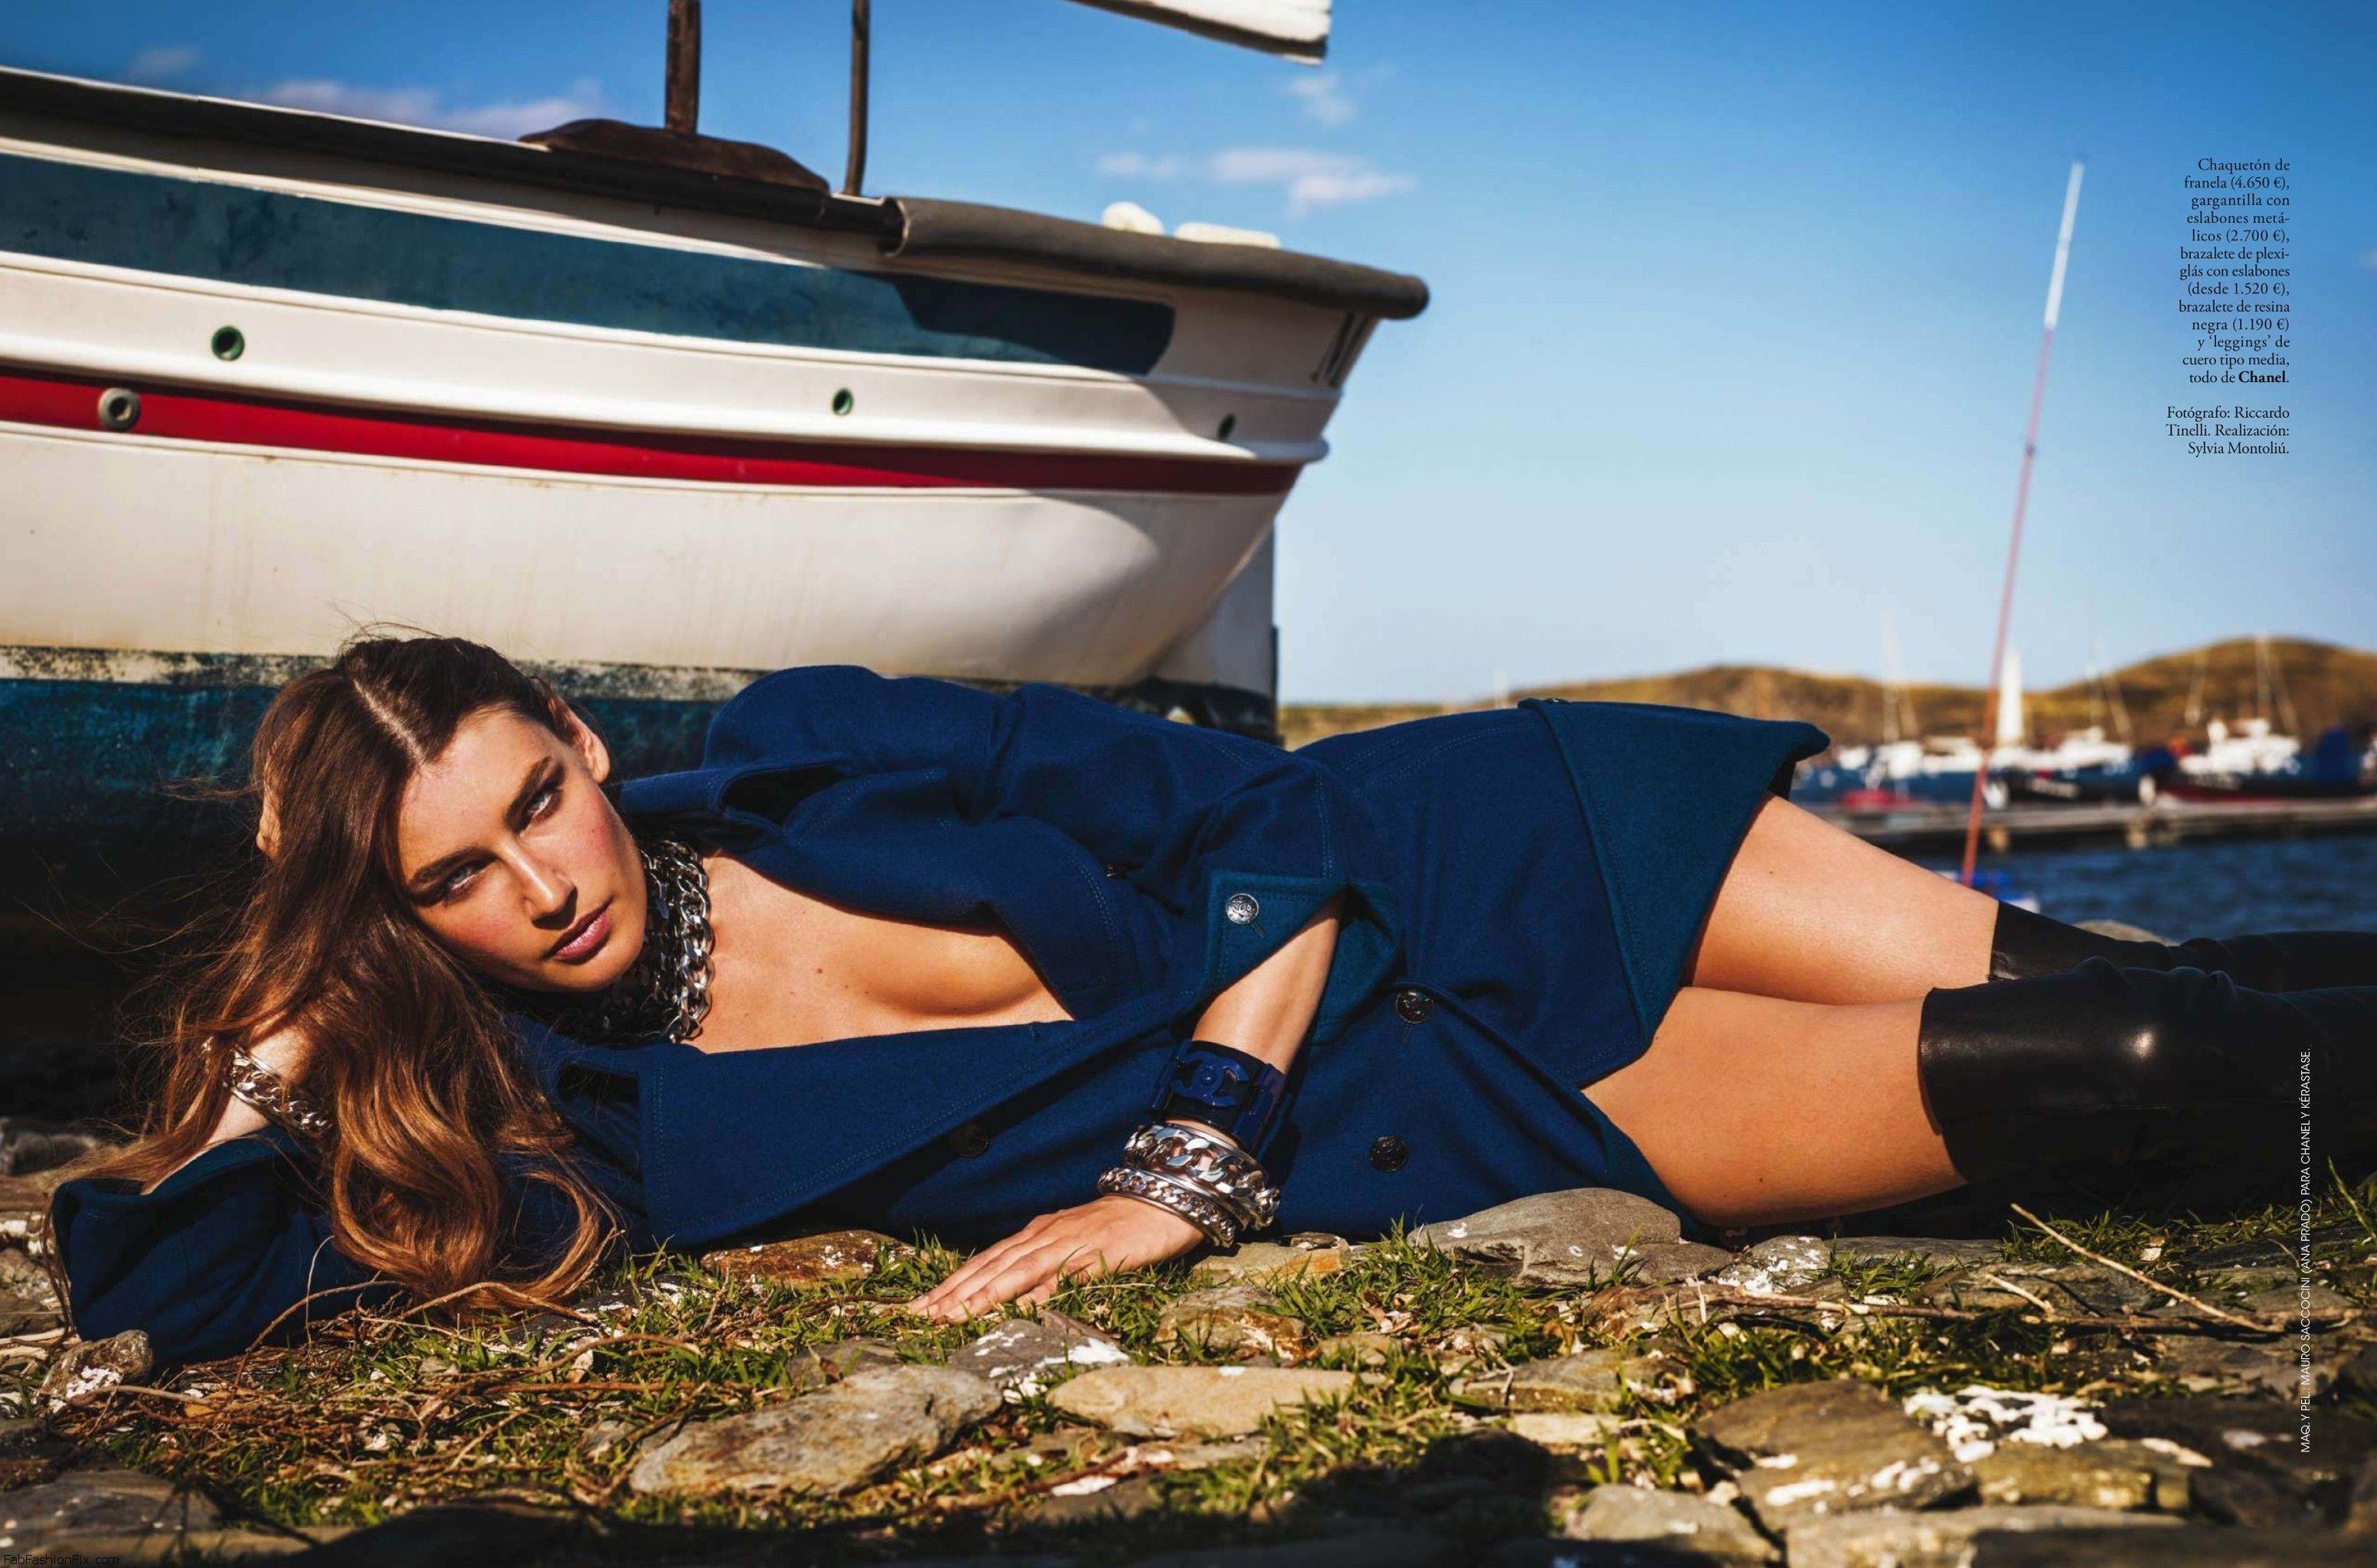 fashion_scans_remastered-eugenia_volodina-elle_espana-september_2013-scanned_by_vampirehorde-hq-12